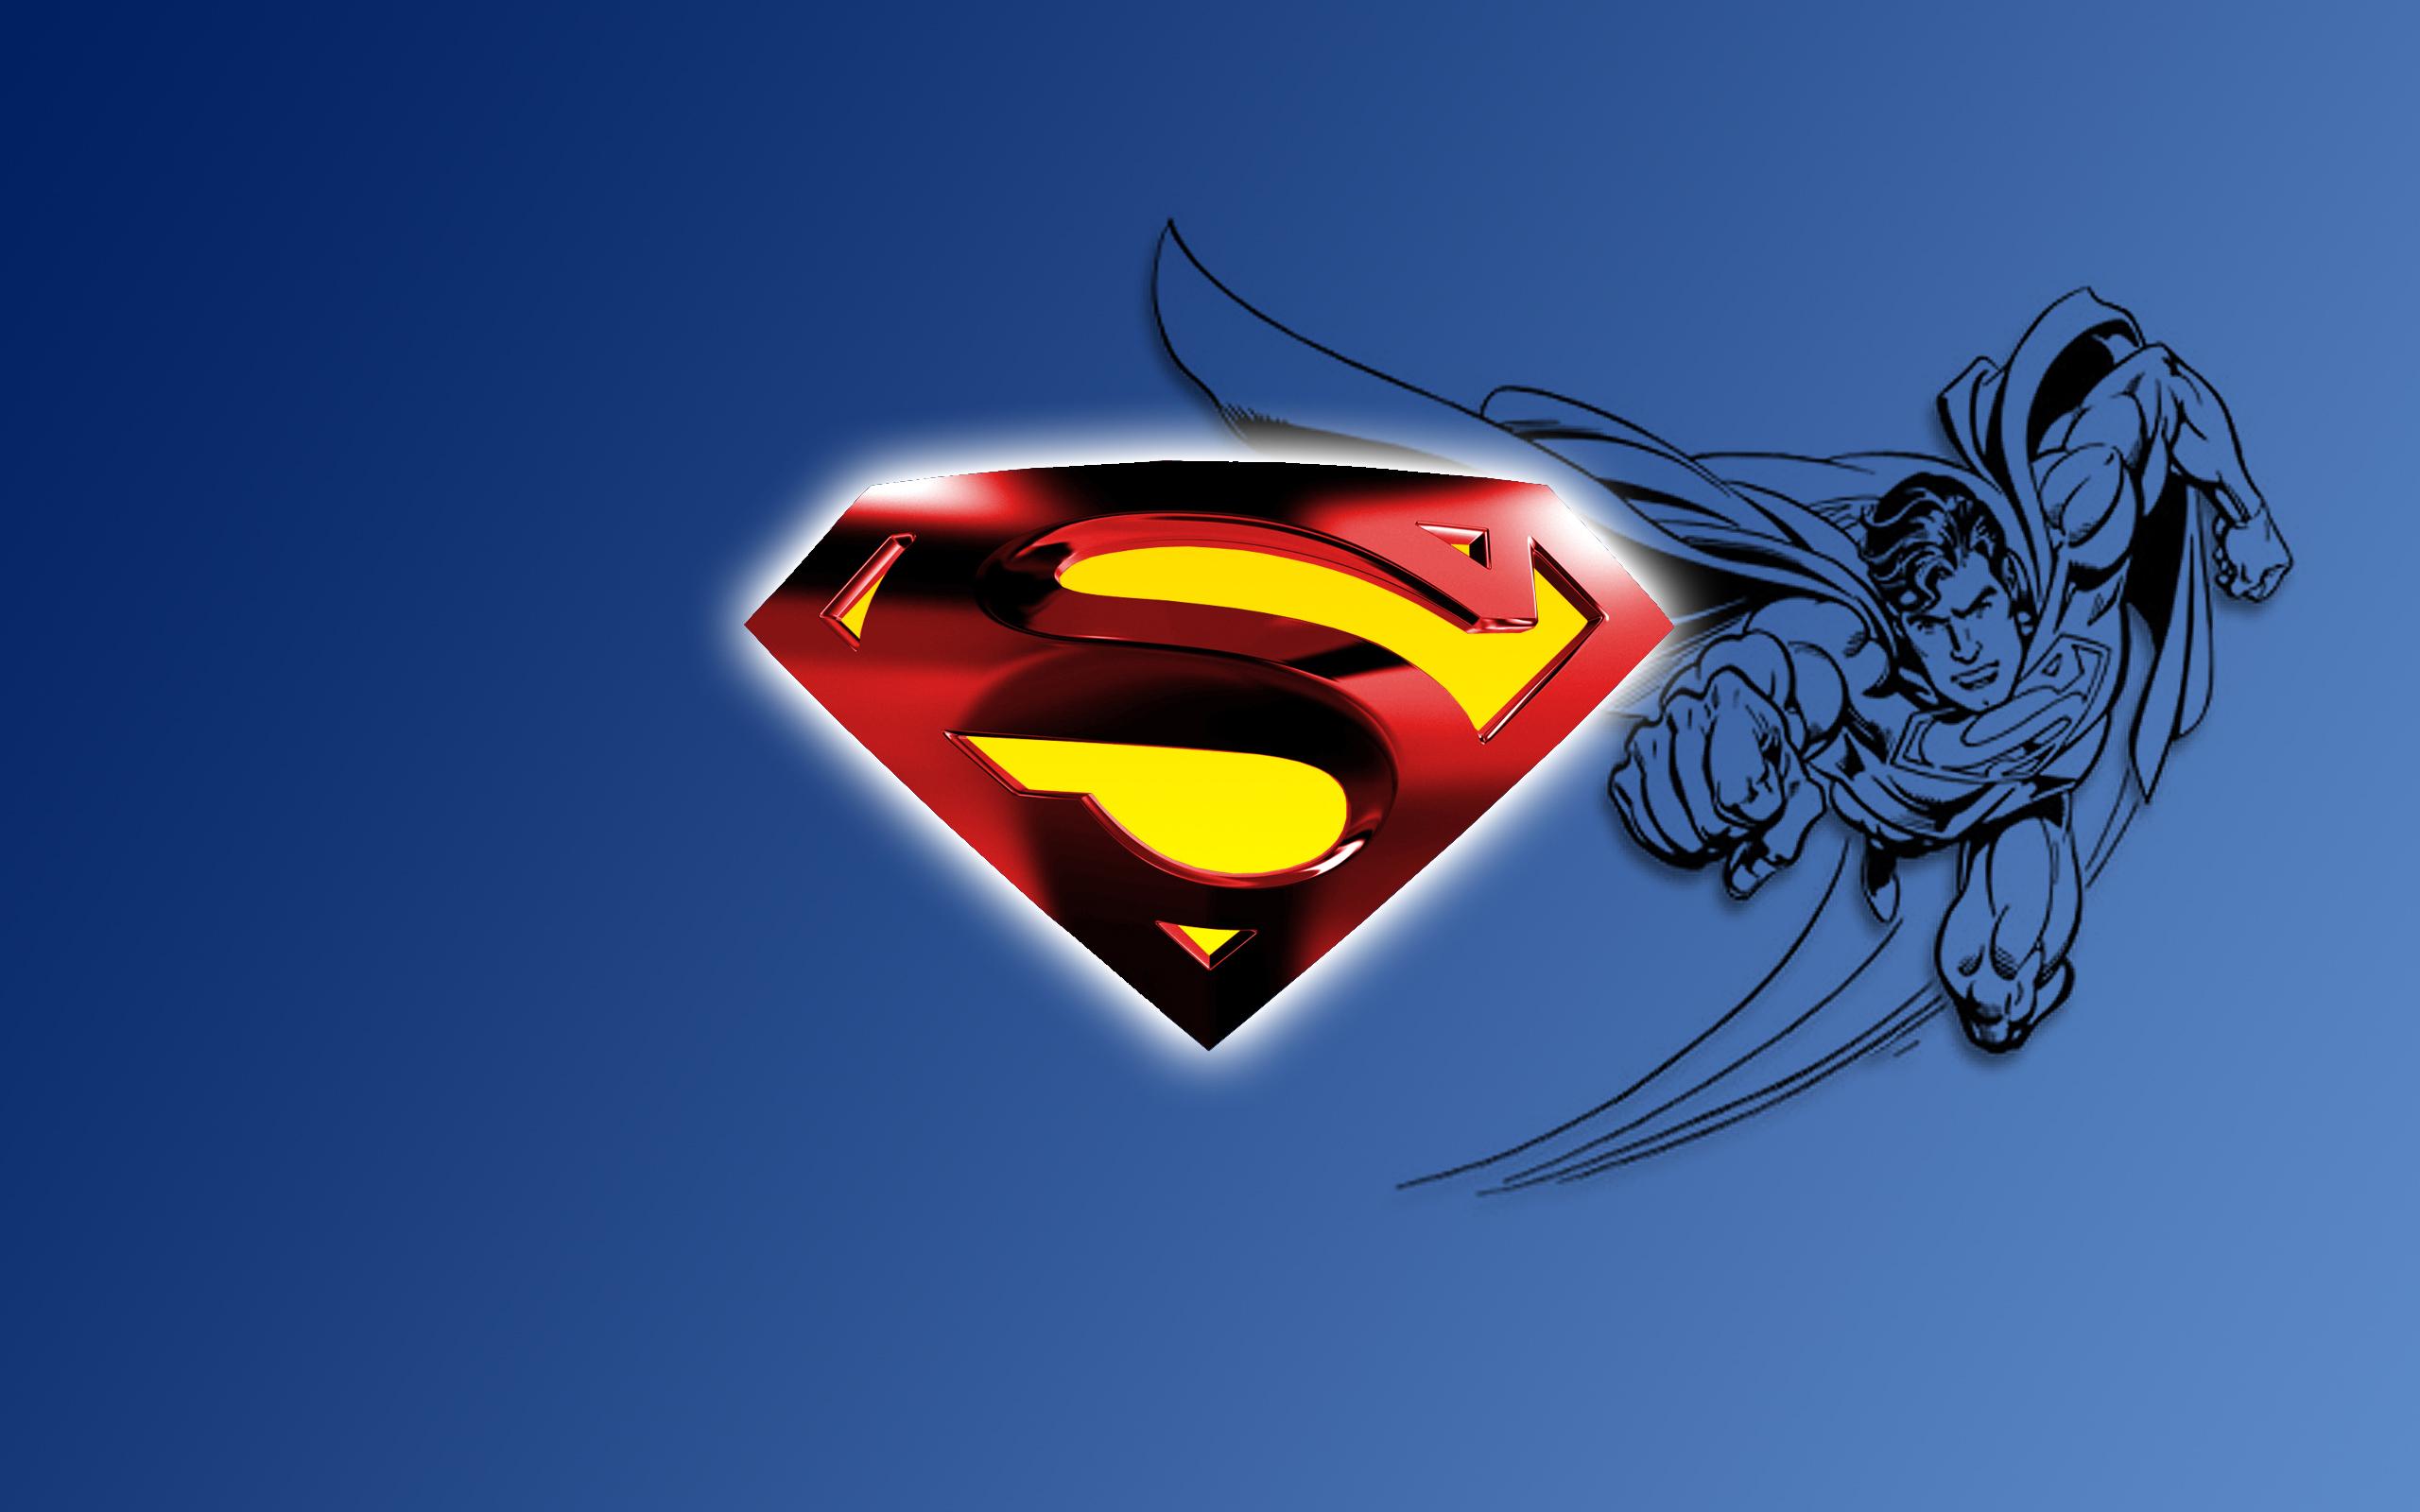 Best 35 Superman HD Wallpaper for Desktop 2560x1600